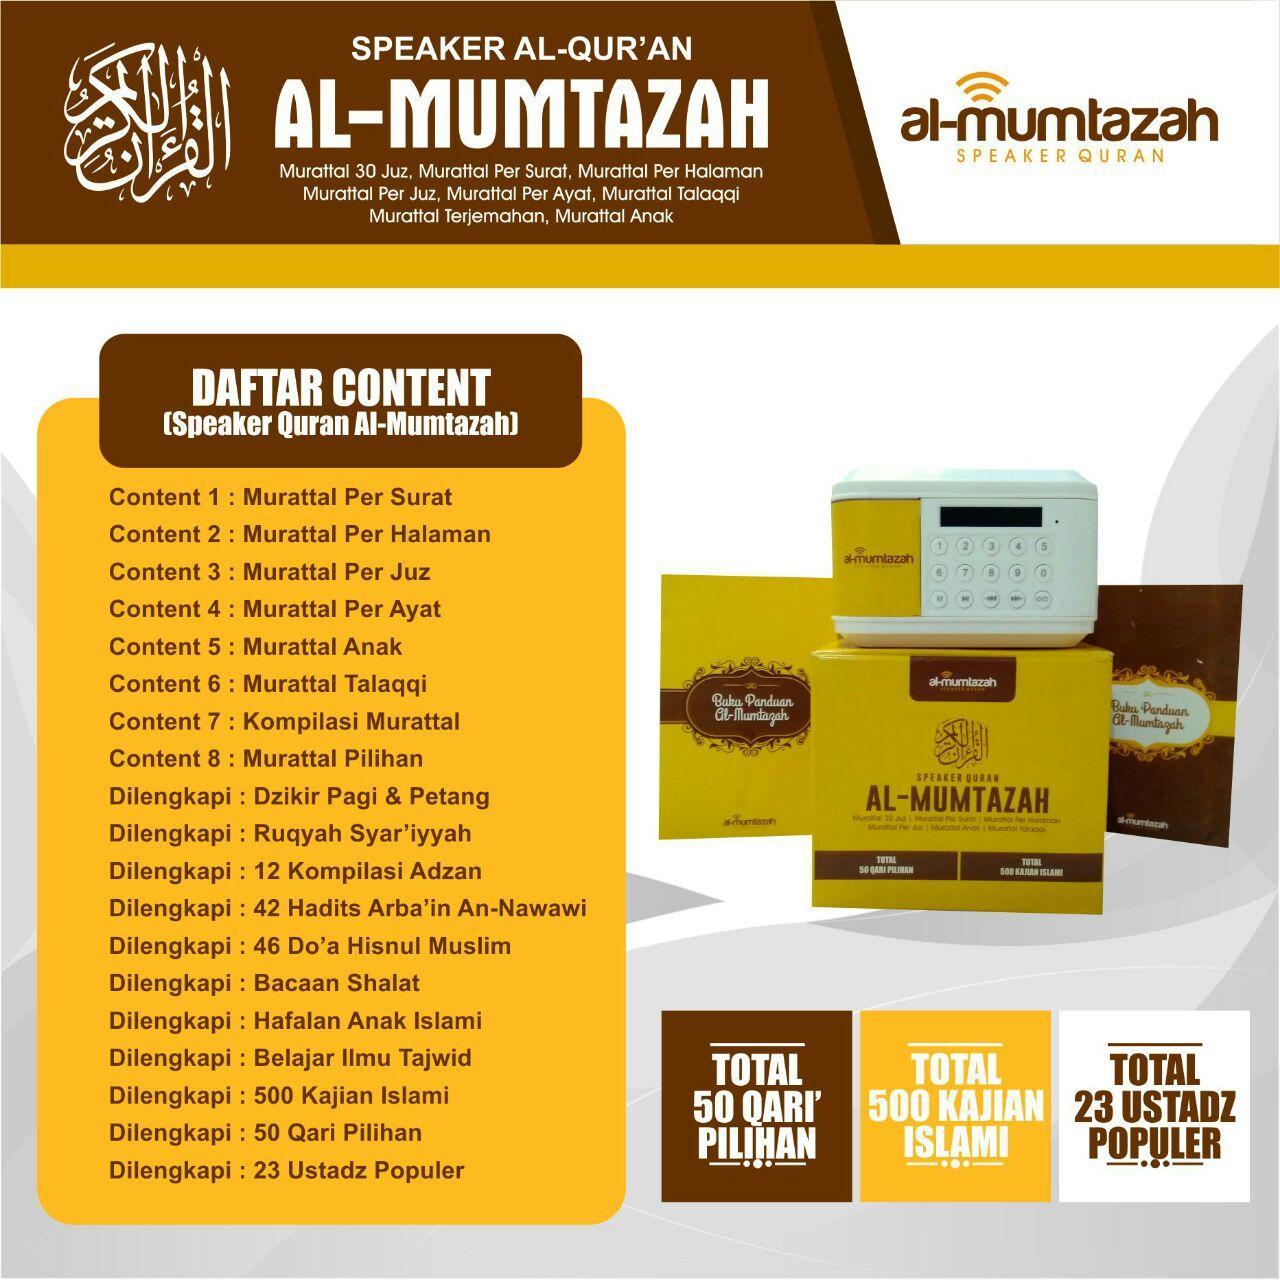 Harga Jual Speaker Murottal Al Quran 25 Qori Best Seller 190000 Rp Radio Model 16gbidr245000 245000 Mini Suara Kencang Seri Fleco F1312idr245000